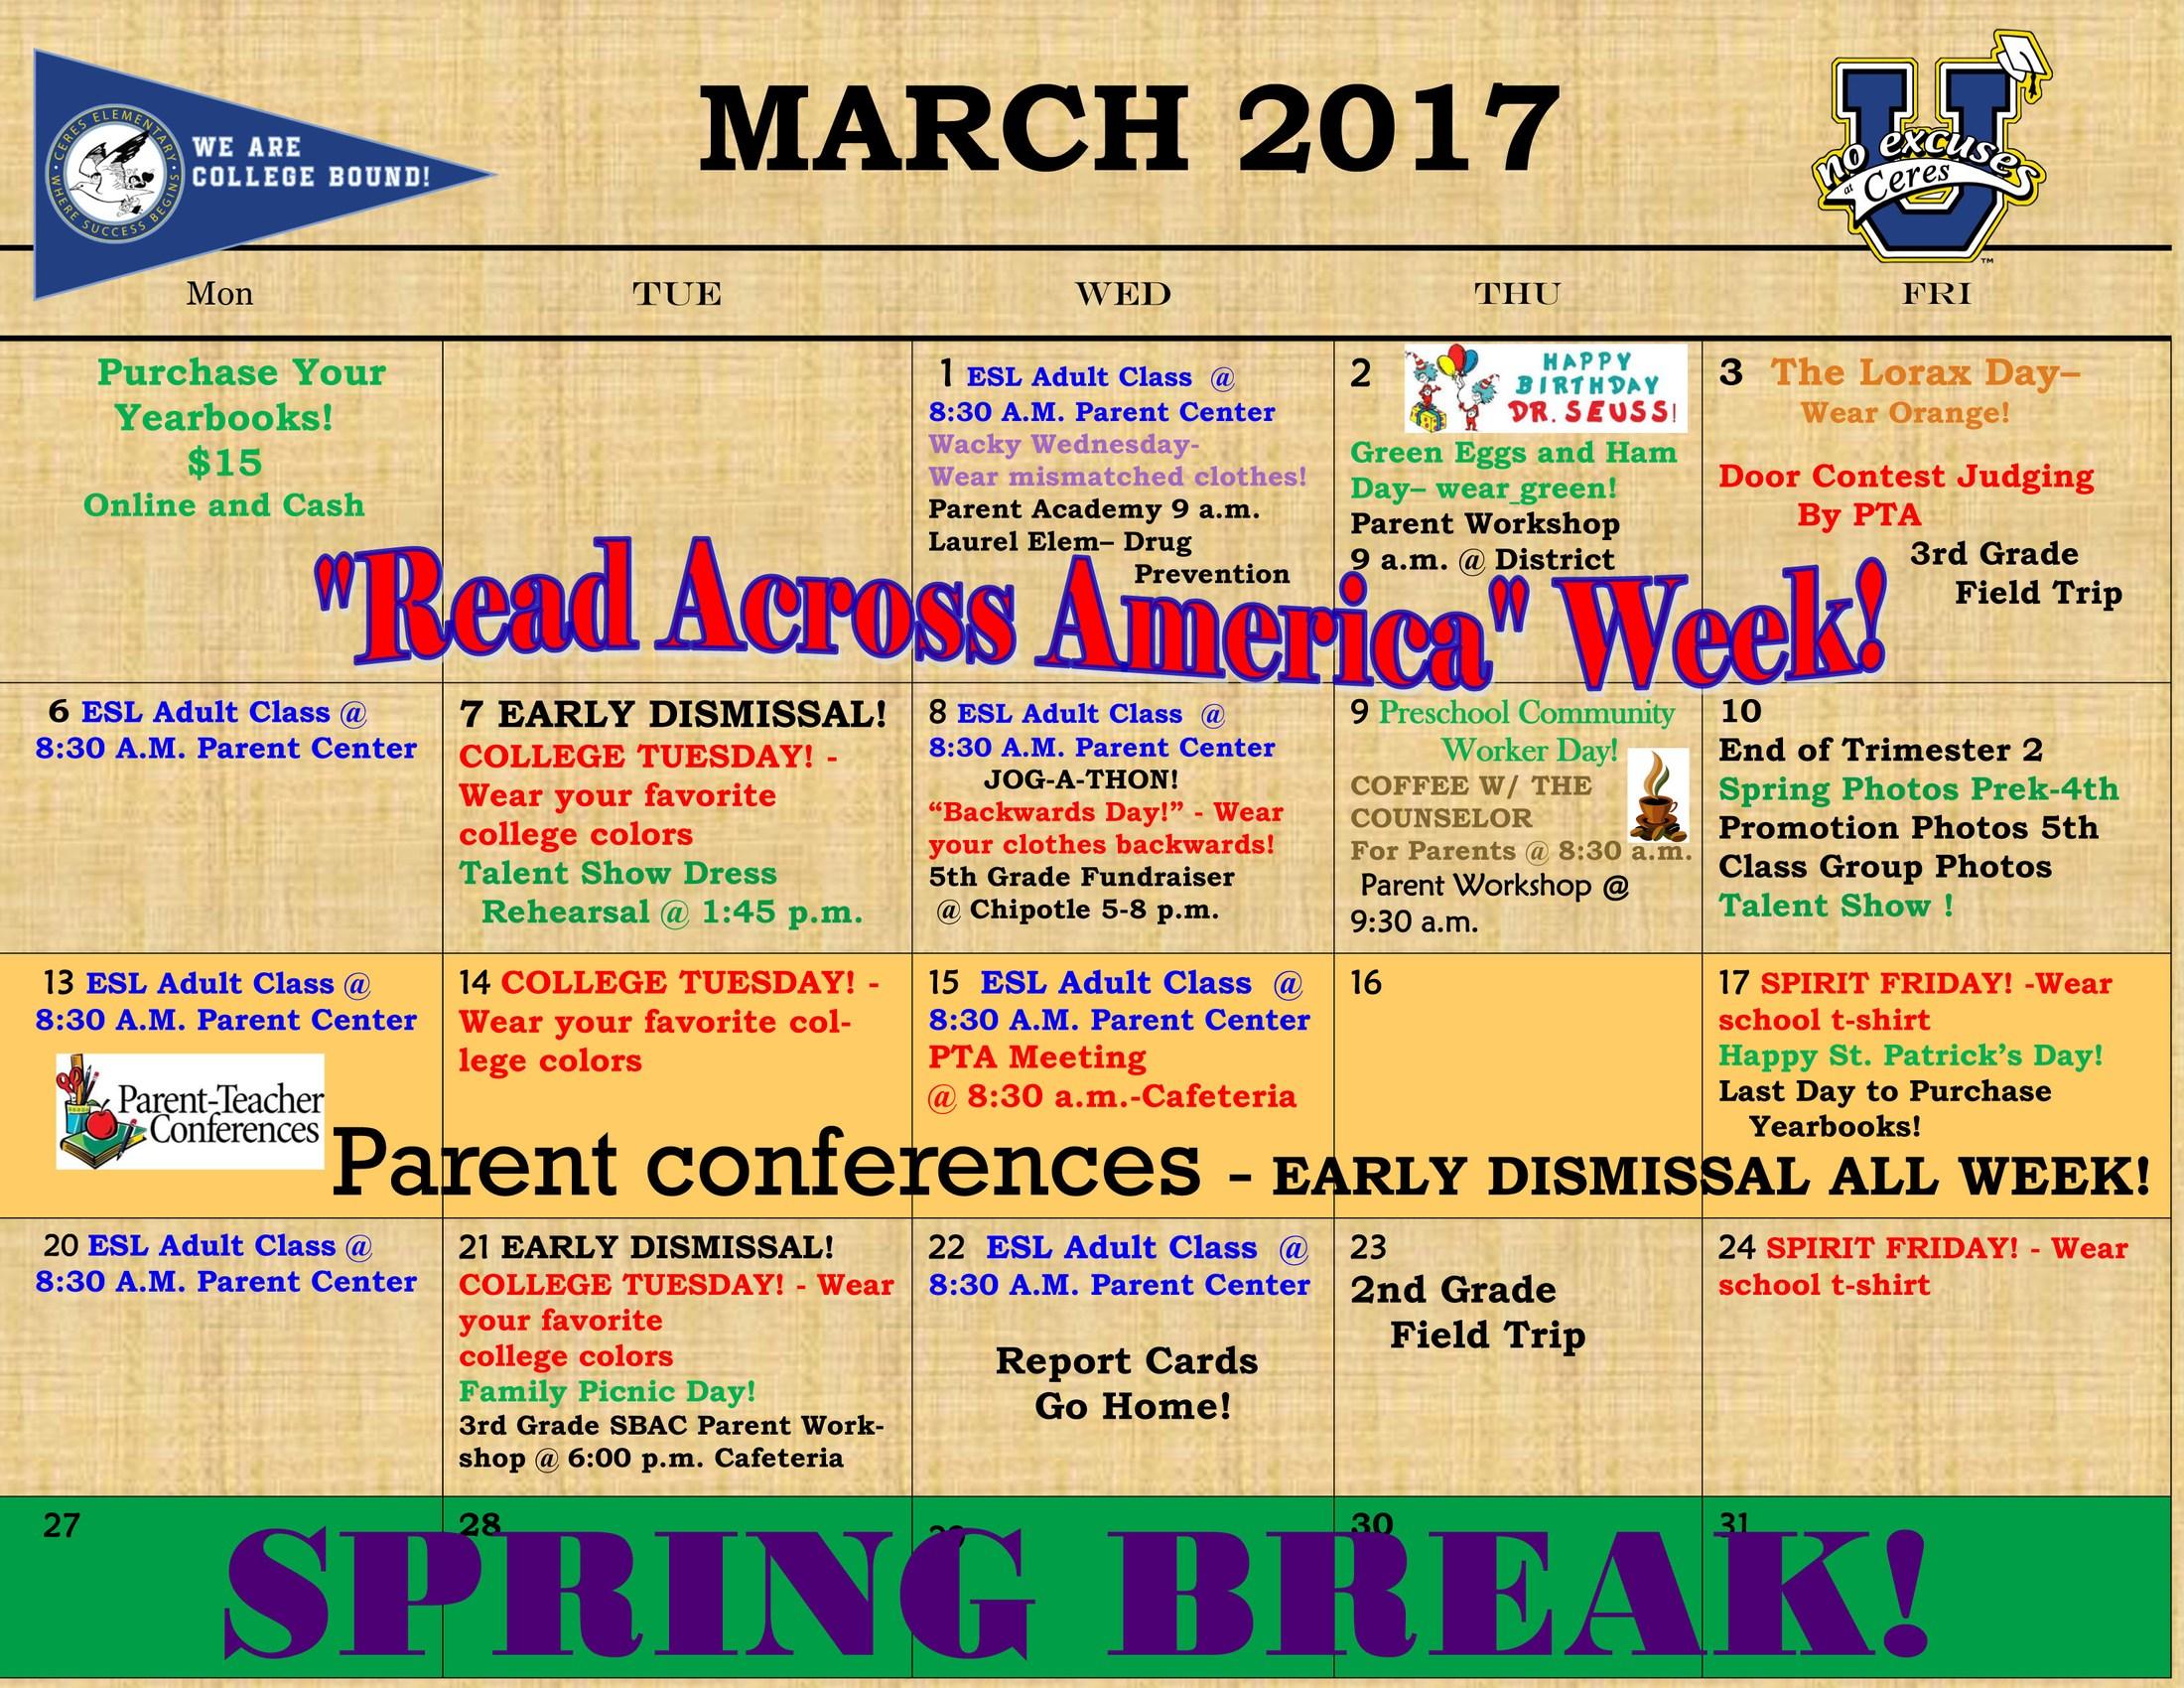 March 2017 school calendar